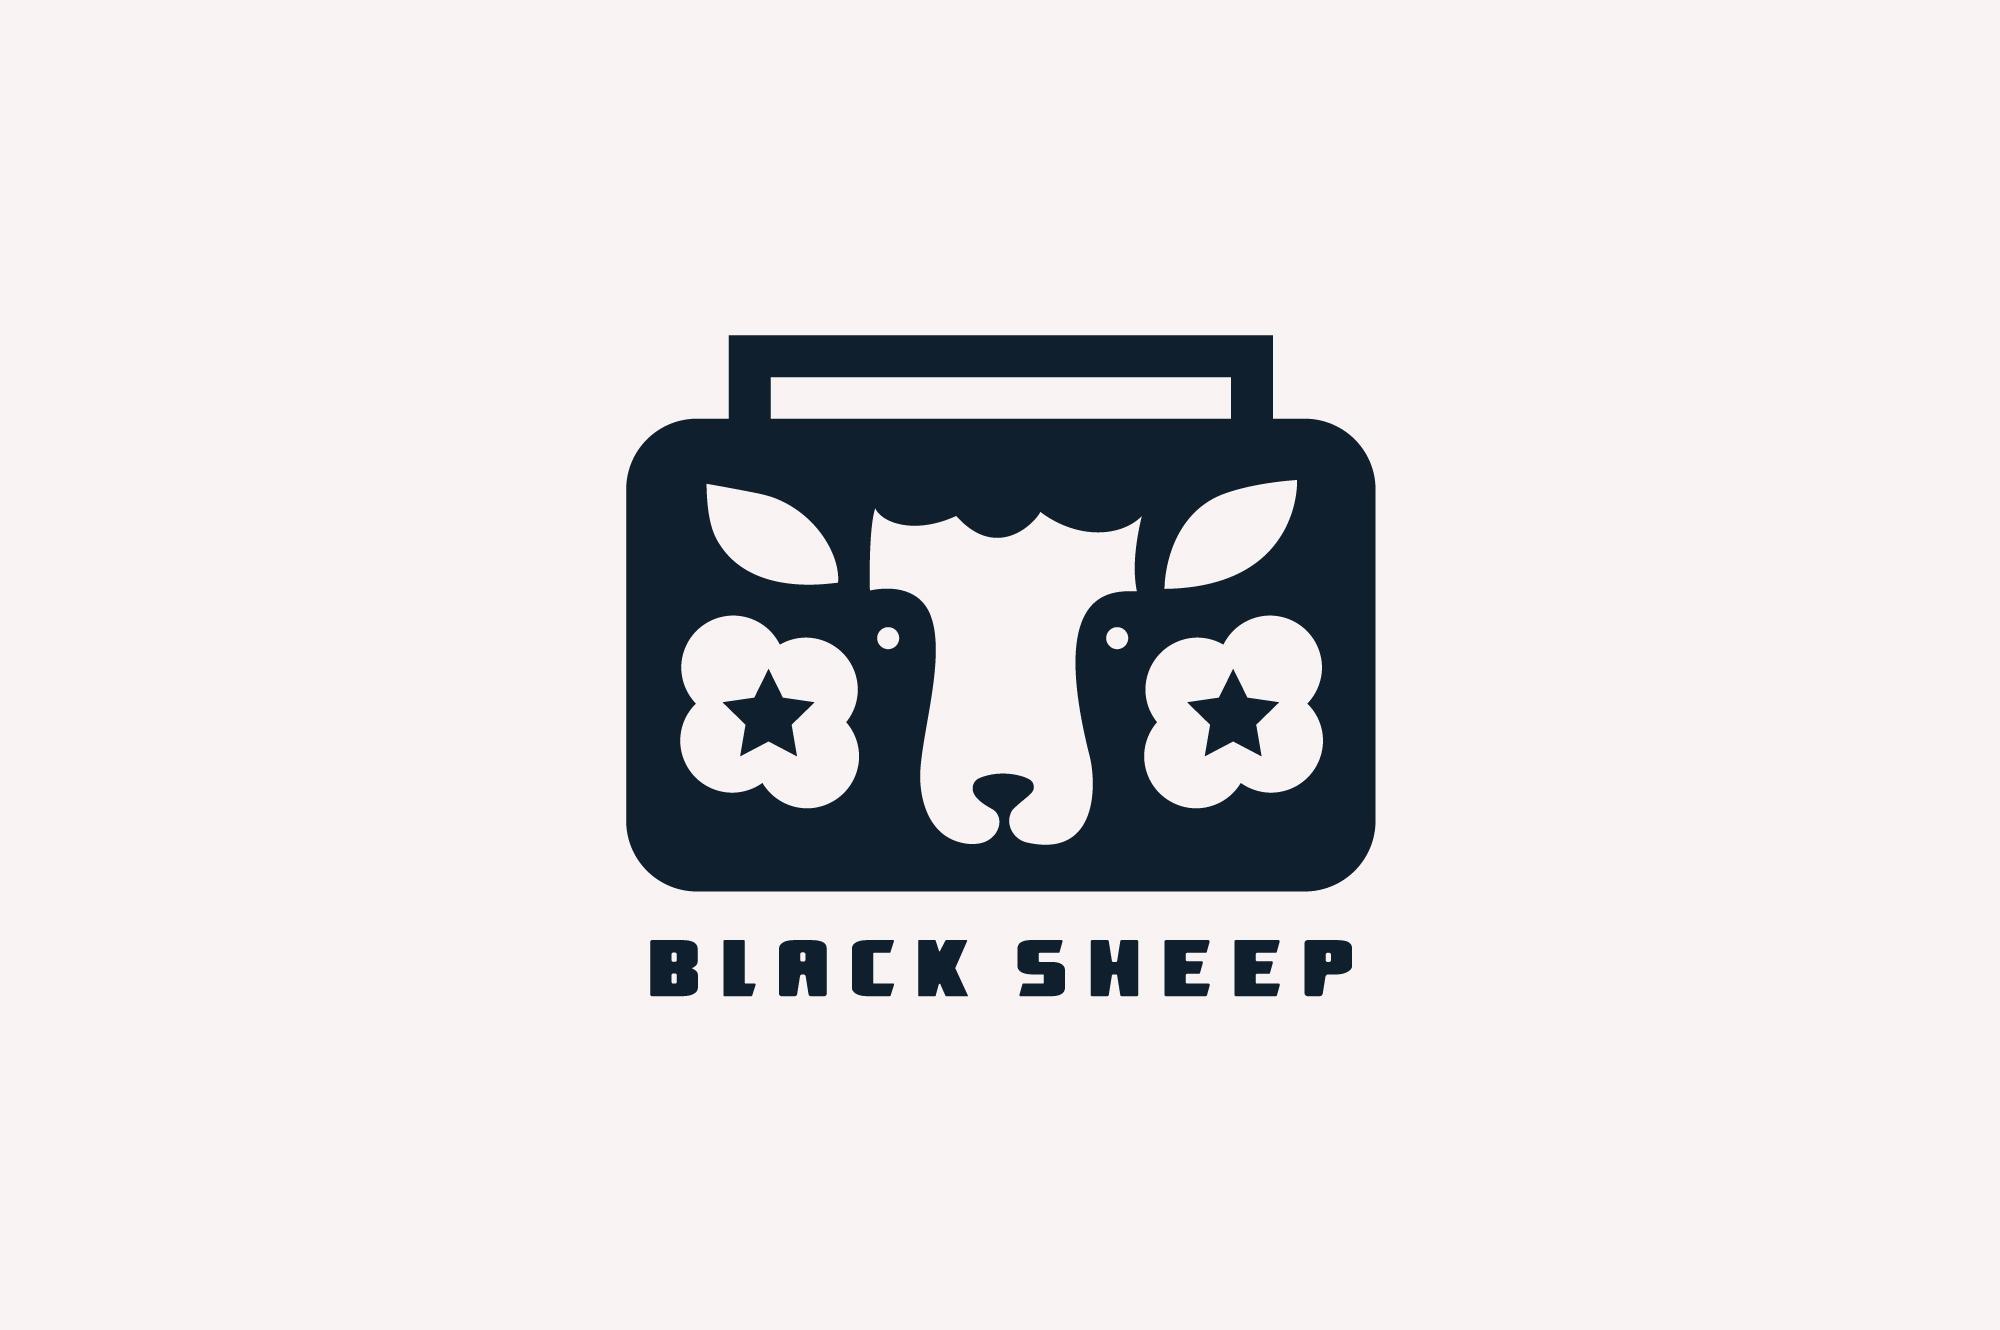 BlackSheep_CaseStudy1.jpg